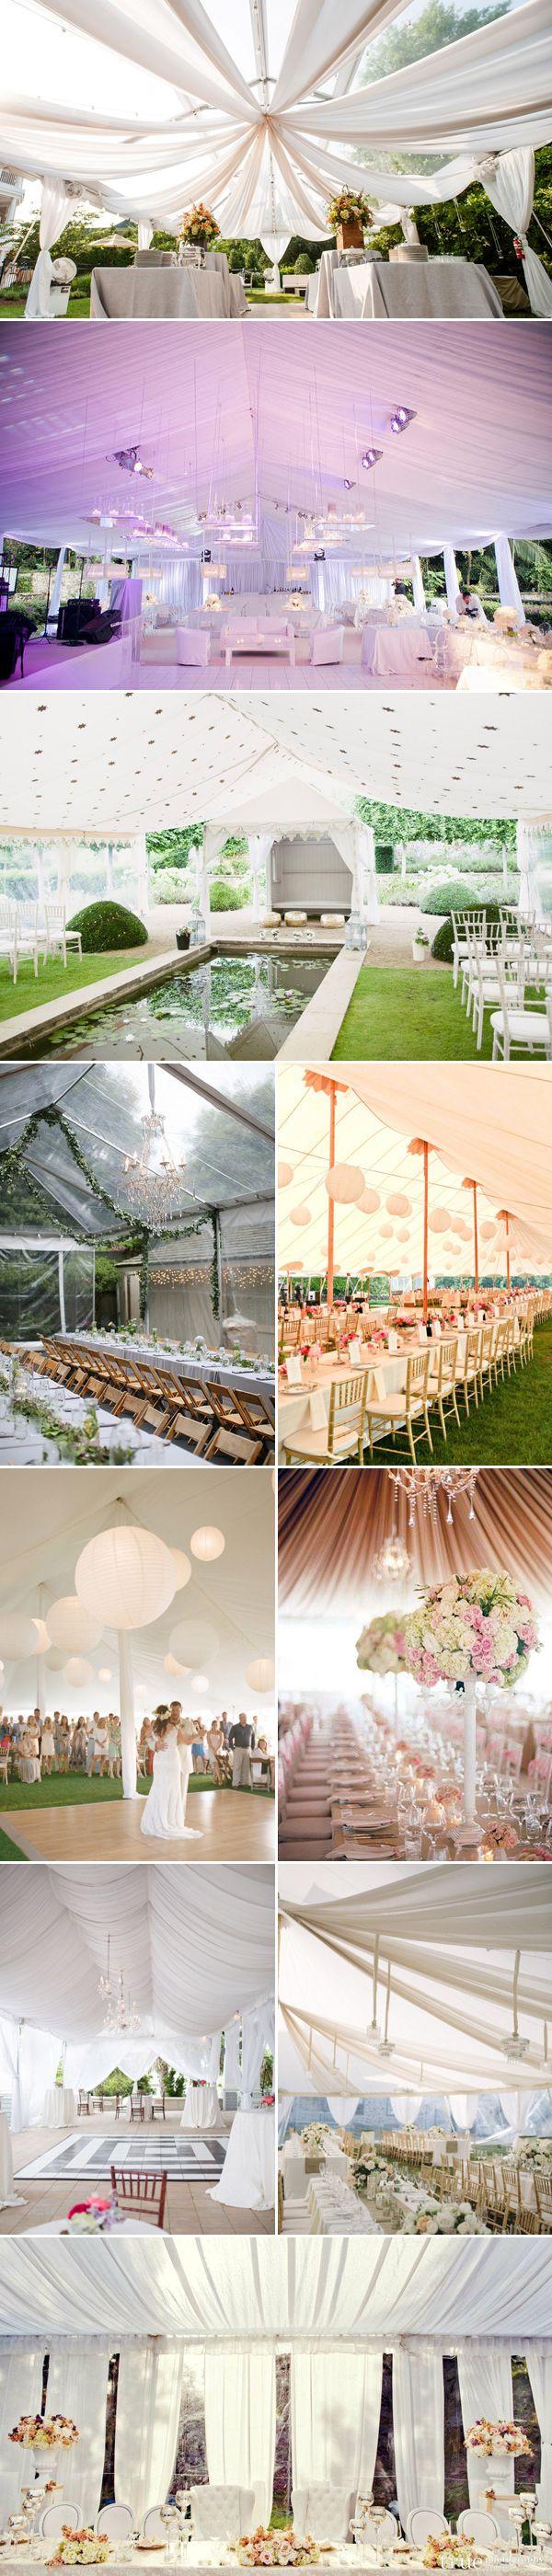 best 25 tent lighting ideas on pinterest outside wedding